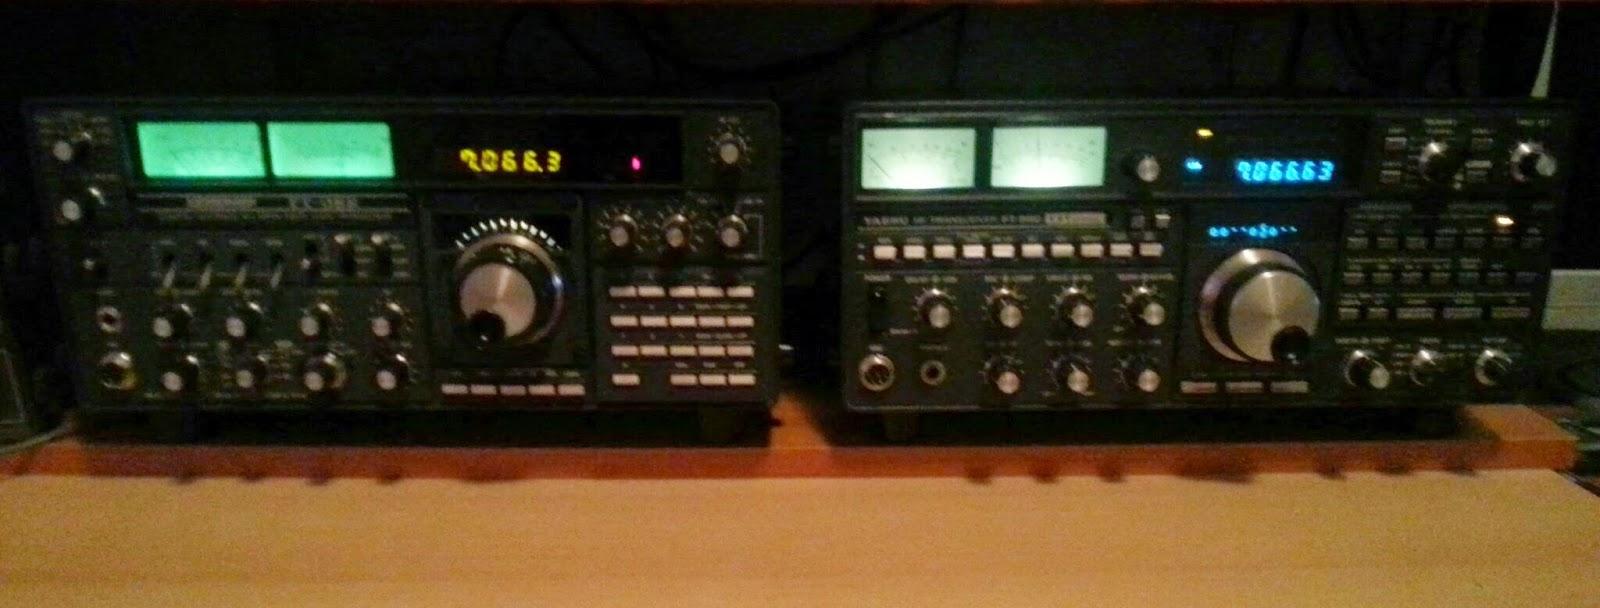 Iv3hls Ham Radio Tales Yaesu Ft One Amp Yaesu Ft 980